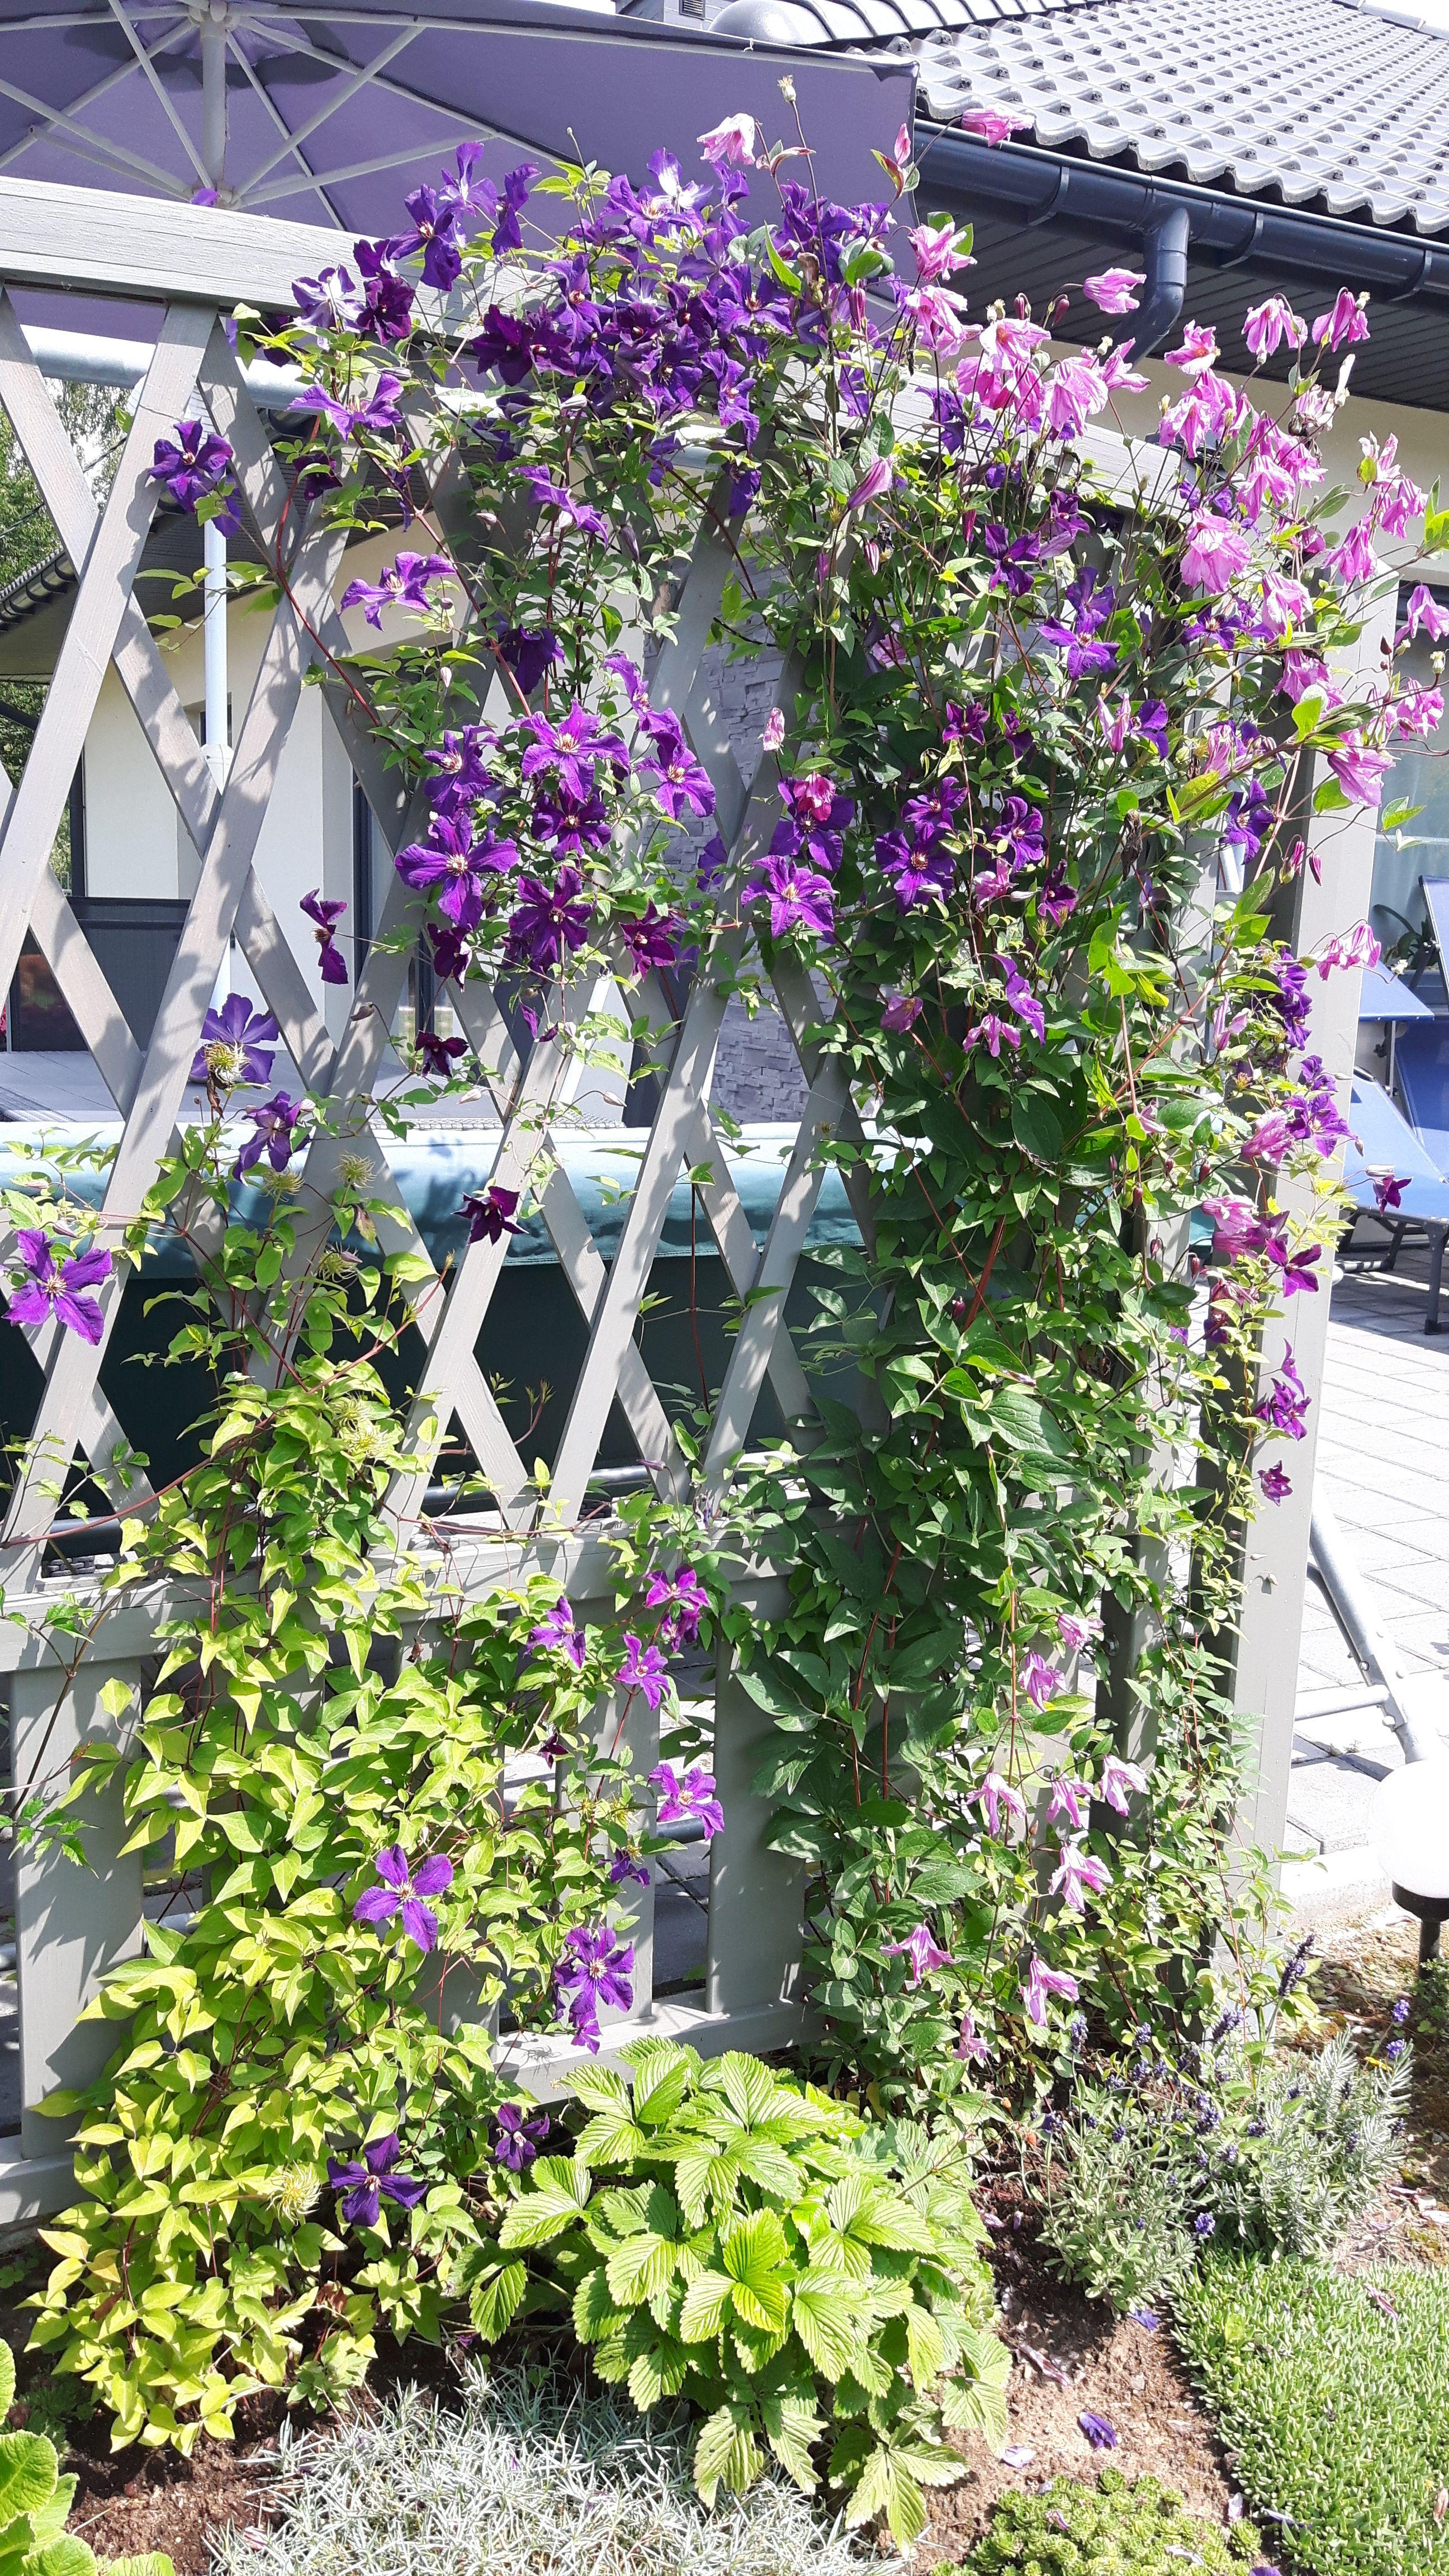 Kwitnace Pnacza Na Pergoli Powojniki Clematis Plants Garden